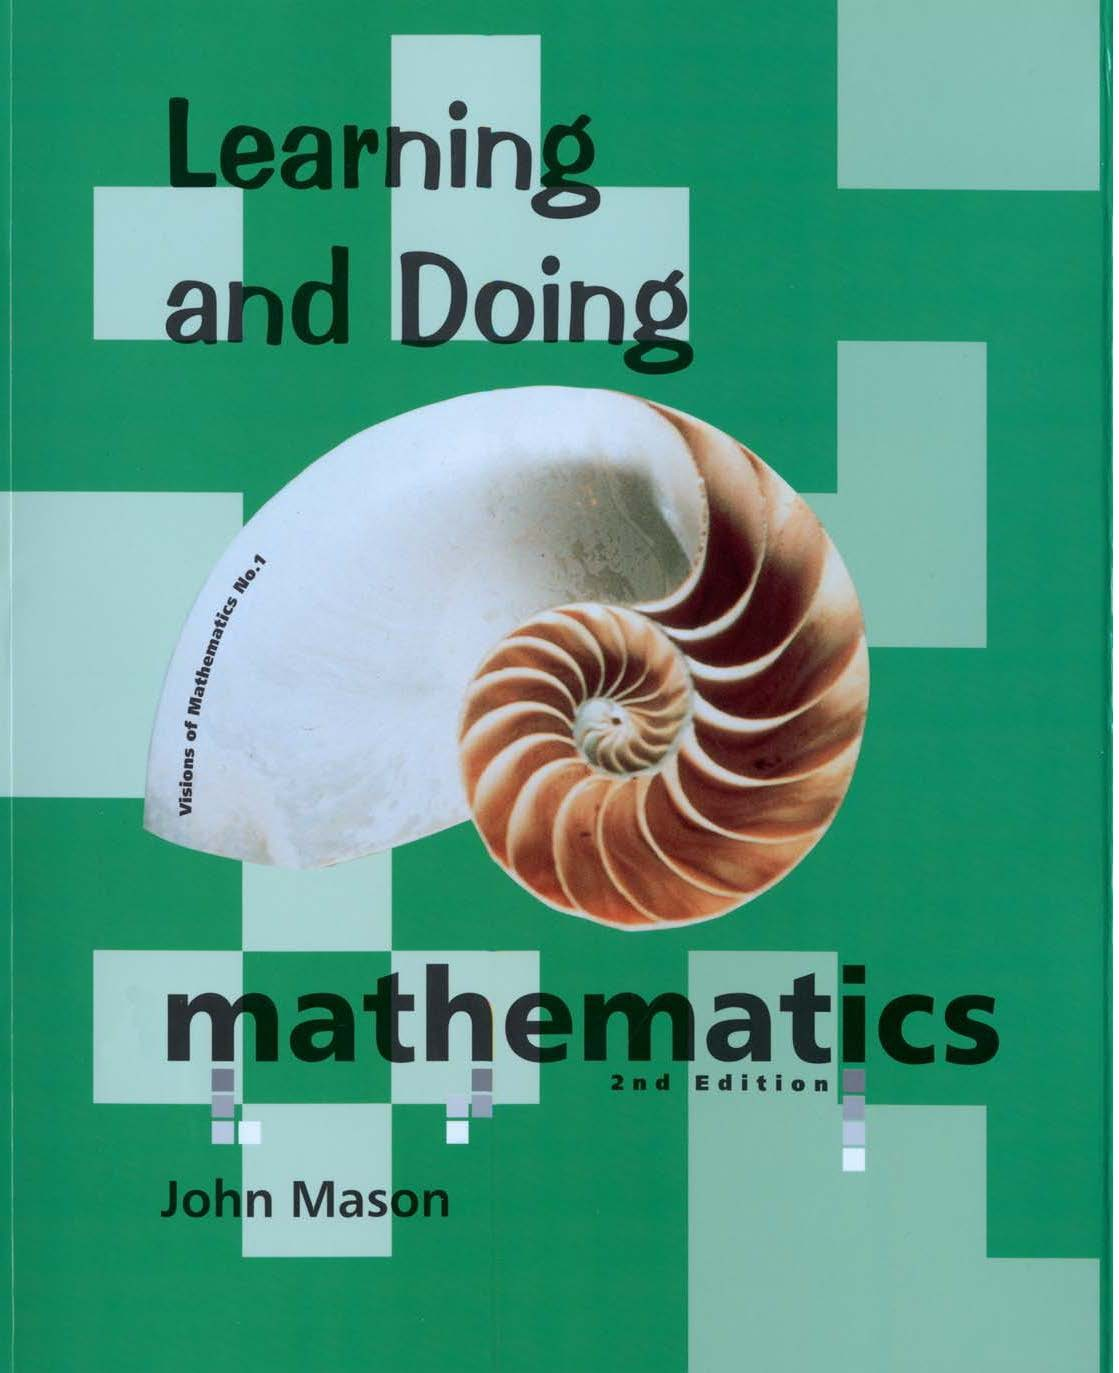 creative writing on mathematics in nature